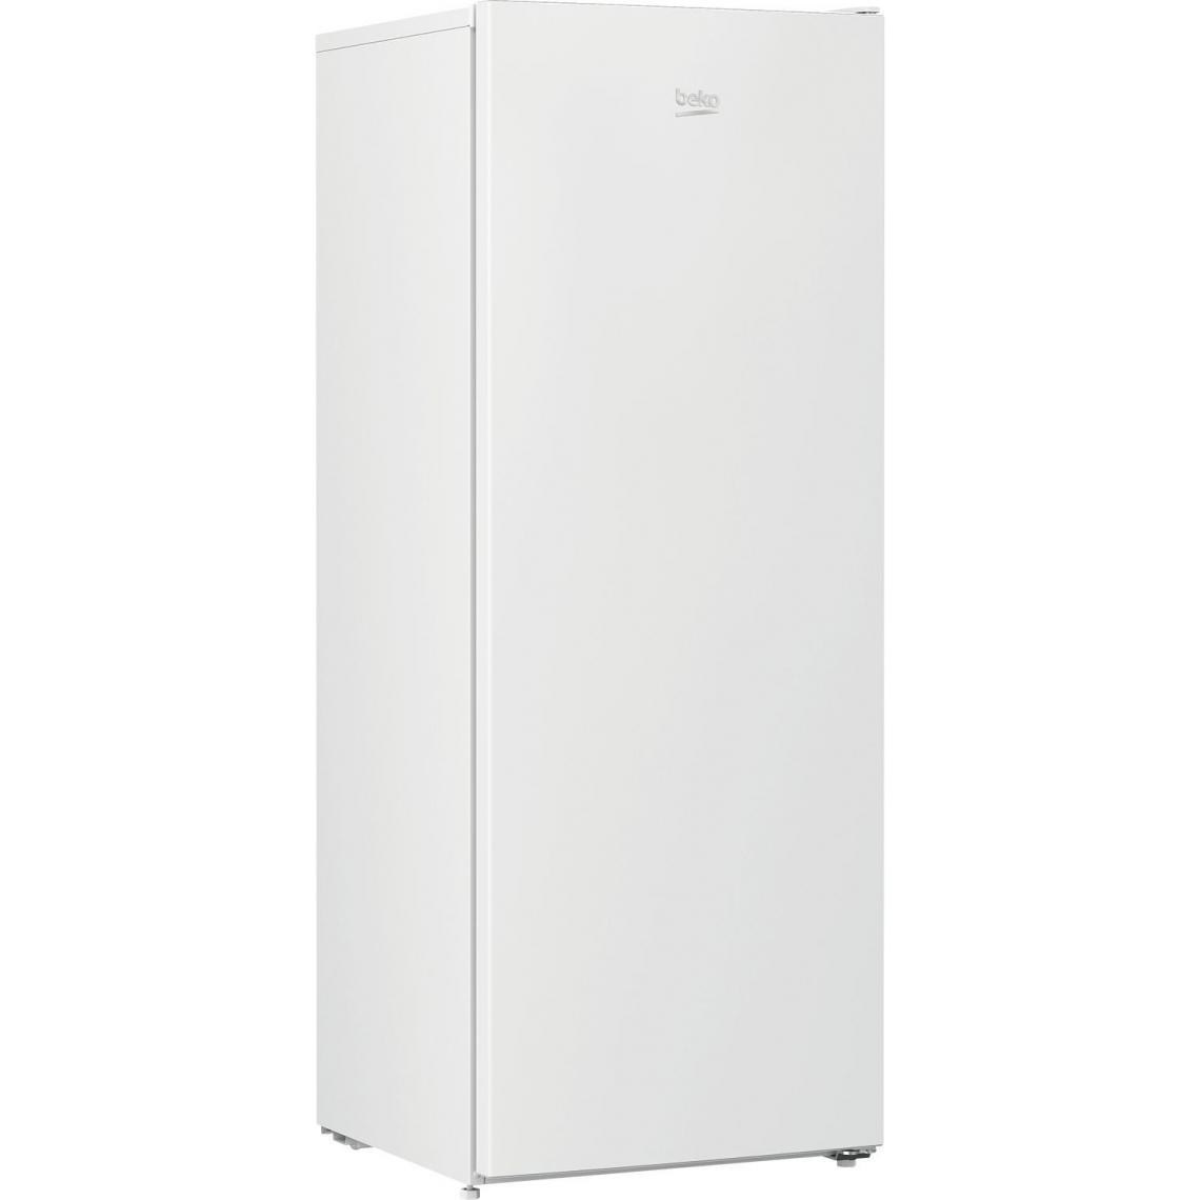 Beko Refrigerateur 1 porte BEKO RSSA 250 K 30 WN